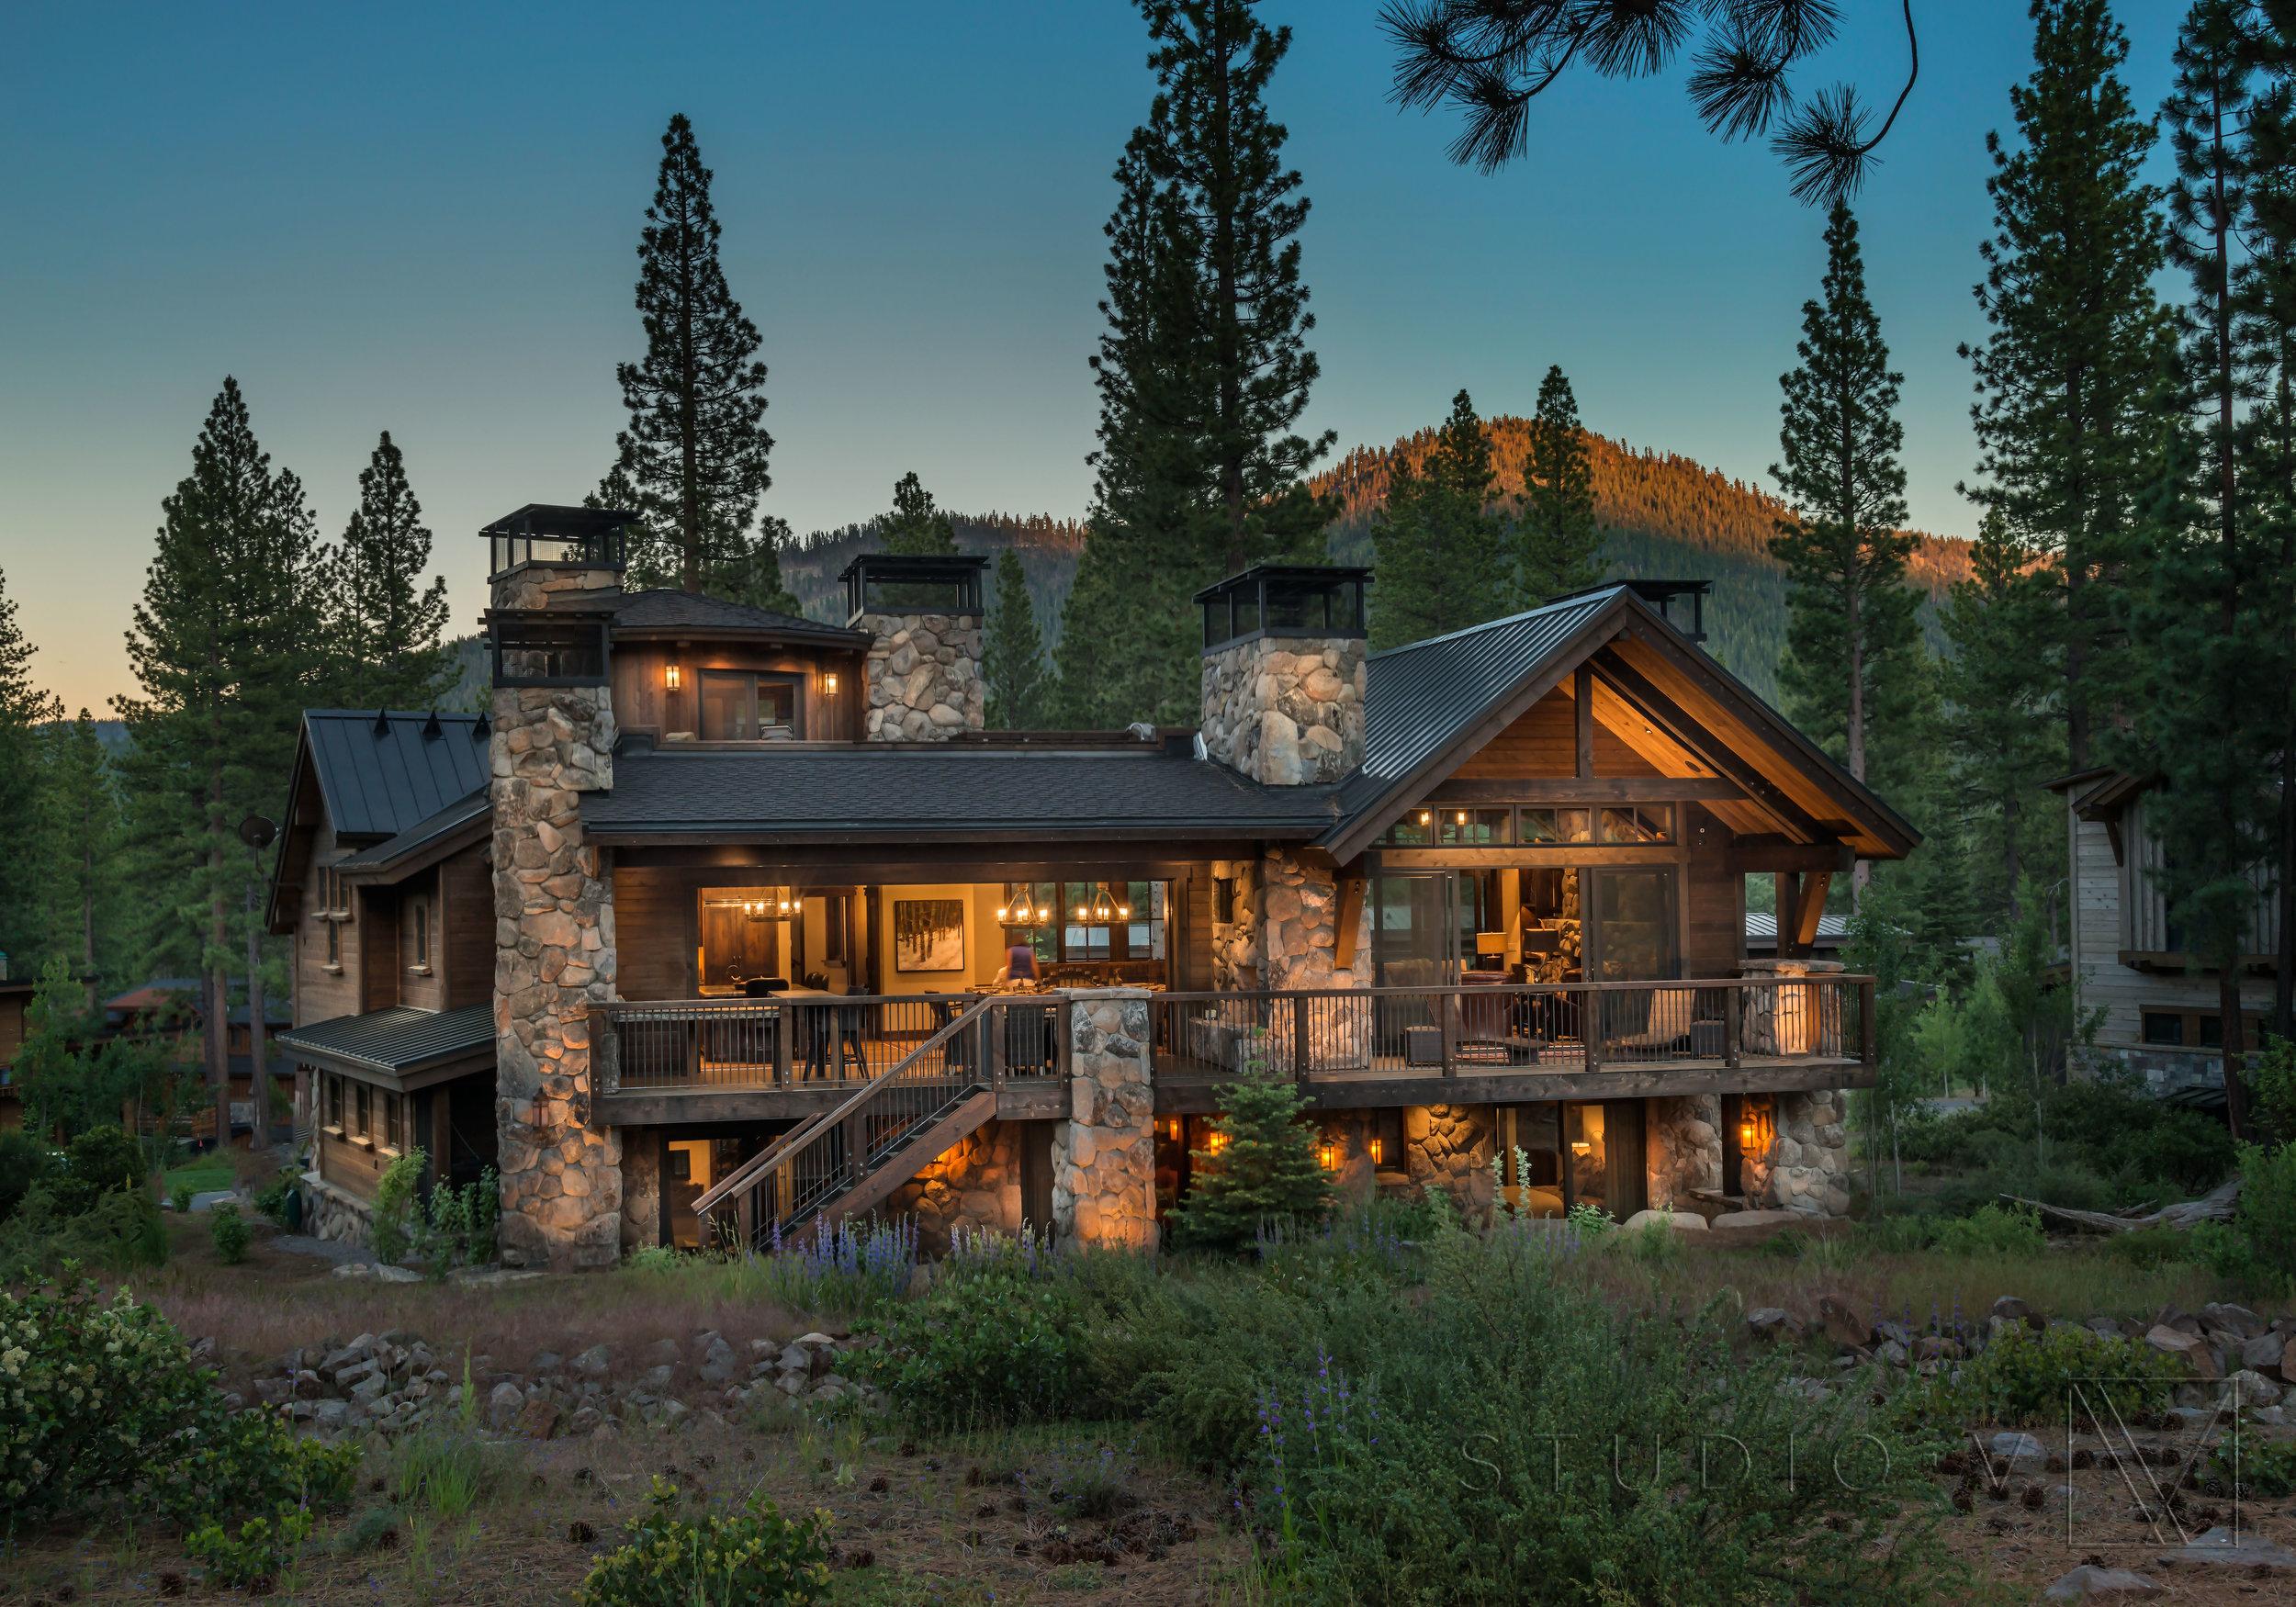 Lodge Cabin Tahoe Truckee Martis Camp CA California Traditional Studio V Interior Architecture Design Scottsdale Arizona AZ (33).jpg